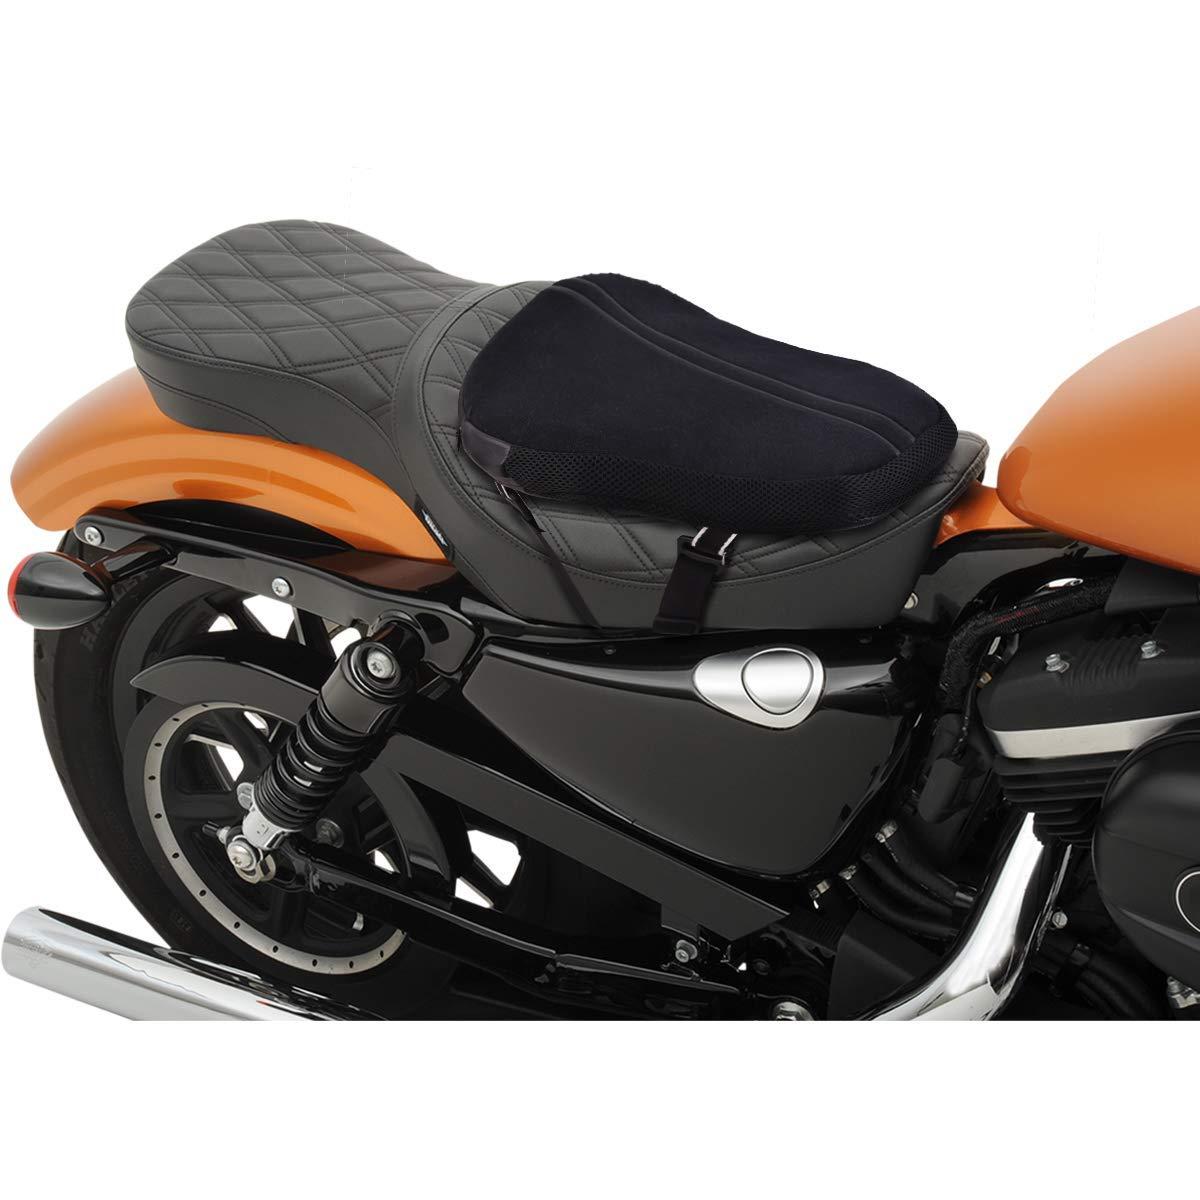 Coussin Selle Moto,Selle Moto S 29,2 x 22,9CM Universel Cruiser Si/ège Air Moto Coussin dair Moto pour Sport Touring pour Yamaha Honda Suzuki Kawasaki Ducati Aprilia Coussin de Moto